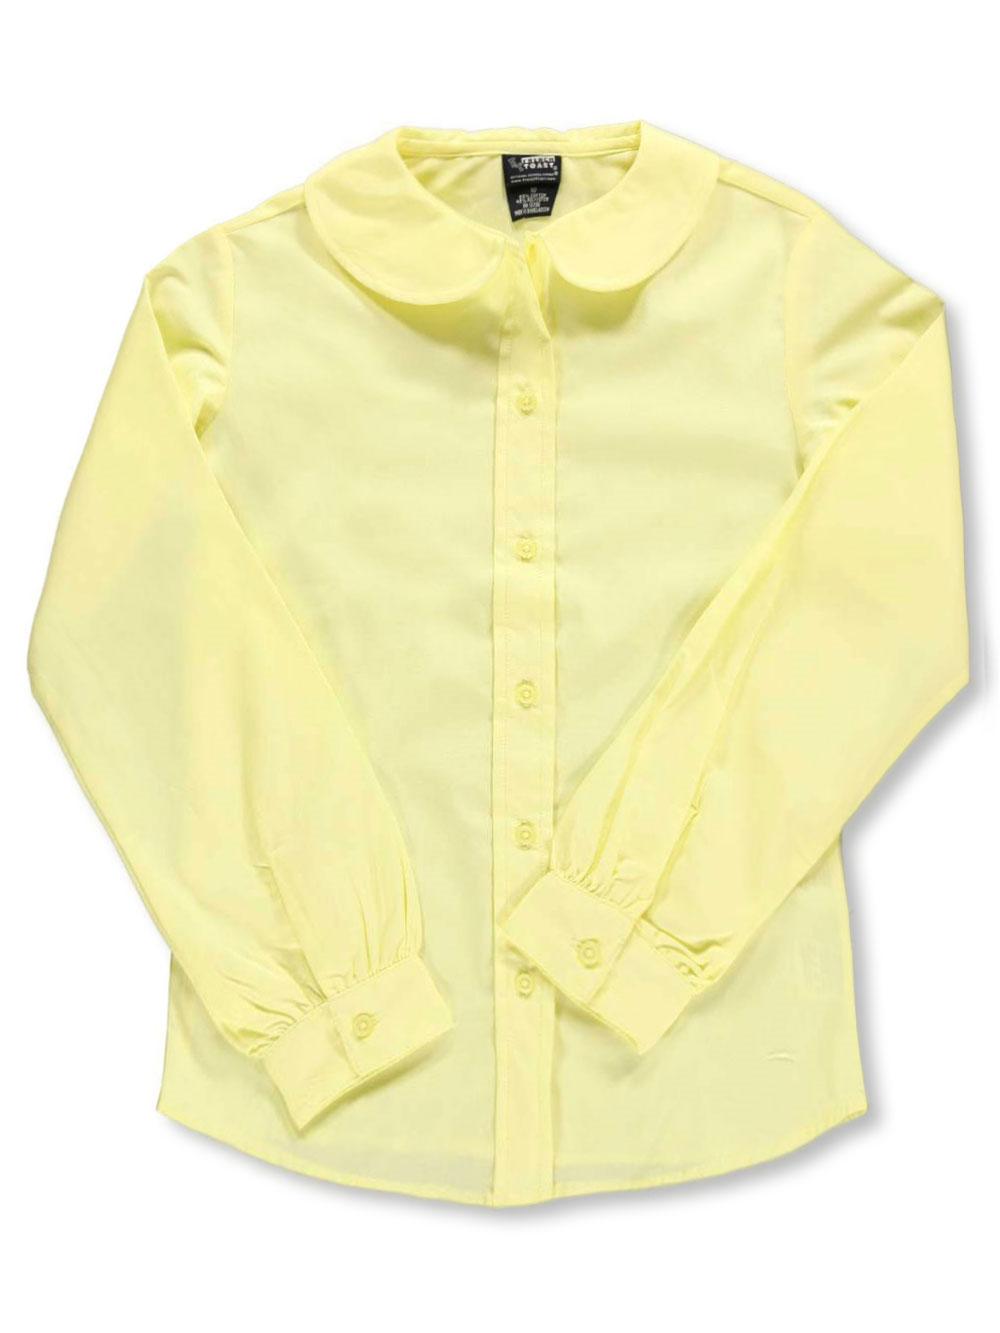 French Toast School Uniform Big Girls' L/S Peter Pan Blouse (Sizes 7 - 16) - yellow, 14